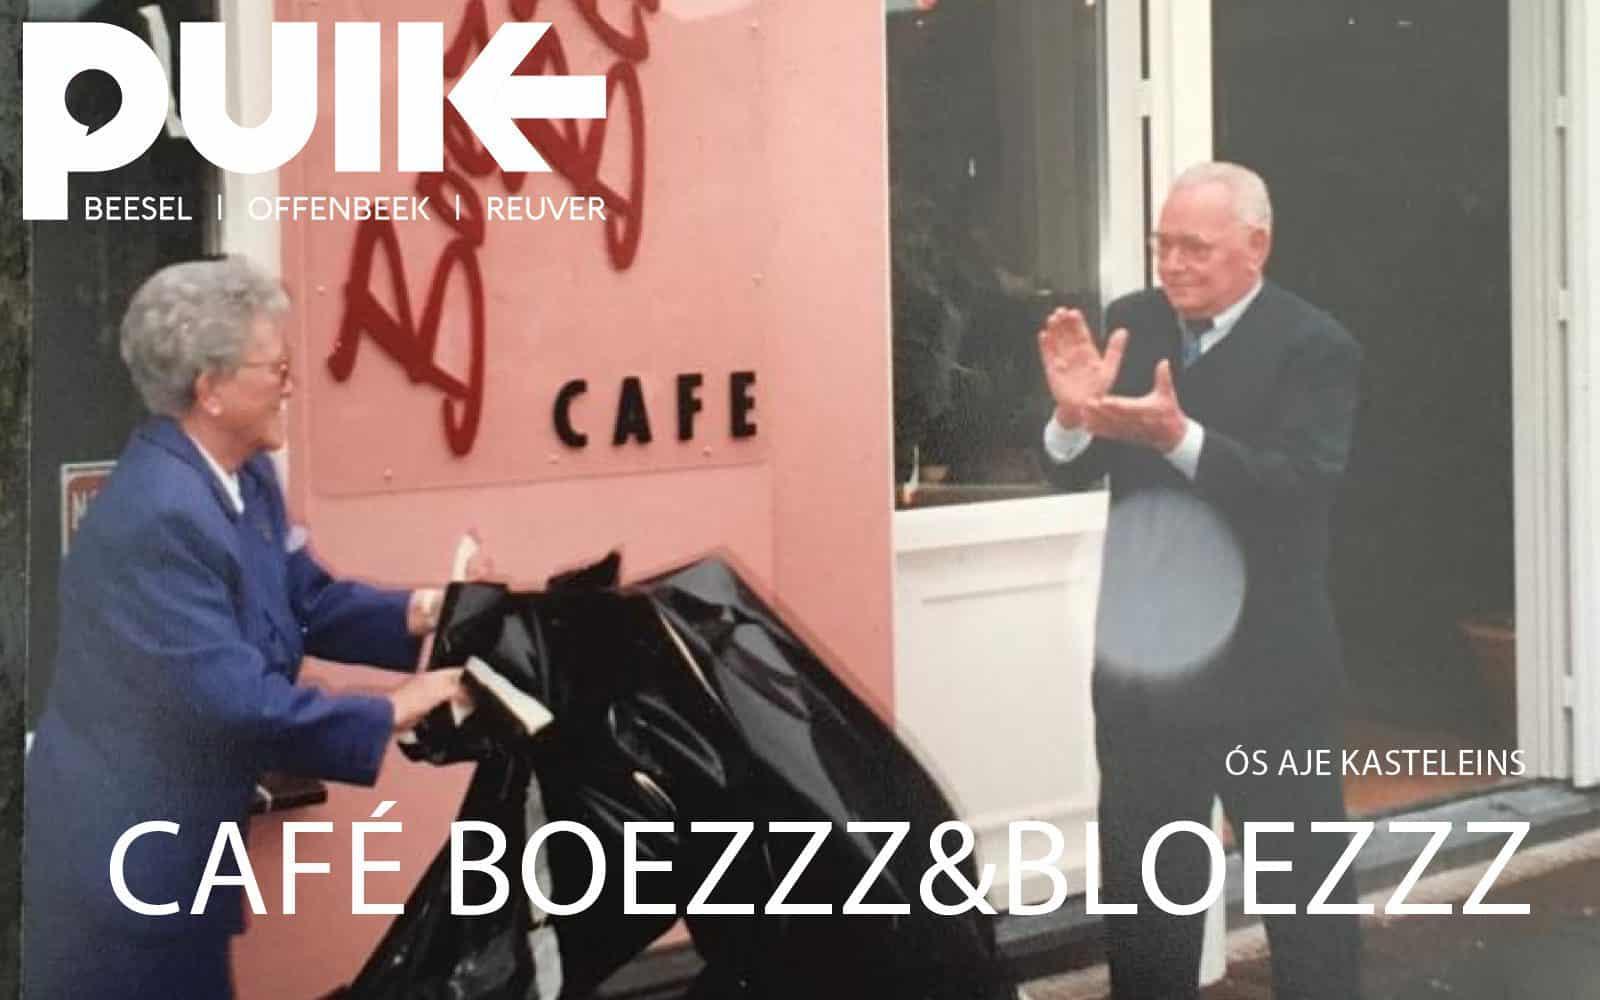 16 oktober 2019 - Cafe Boezzz&Bloezzz